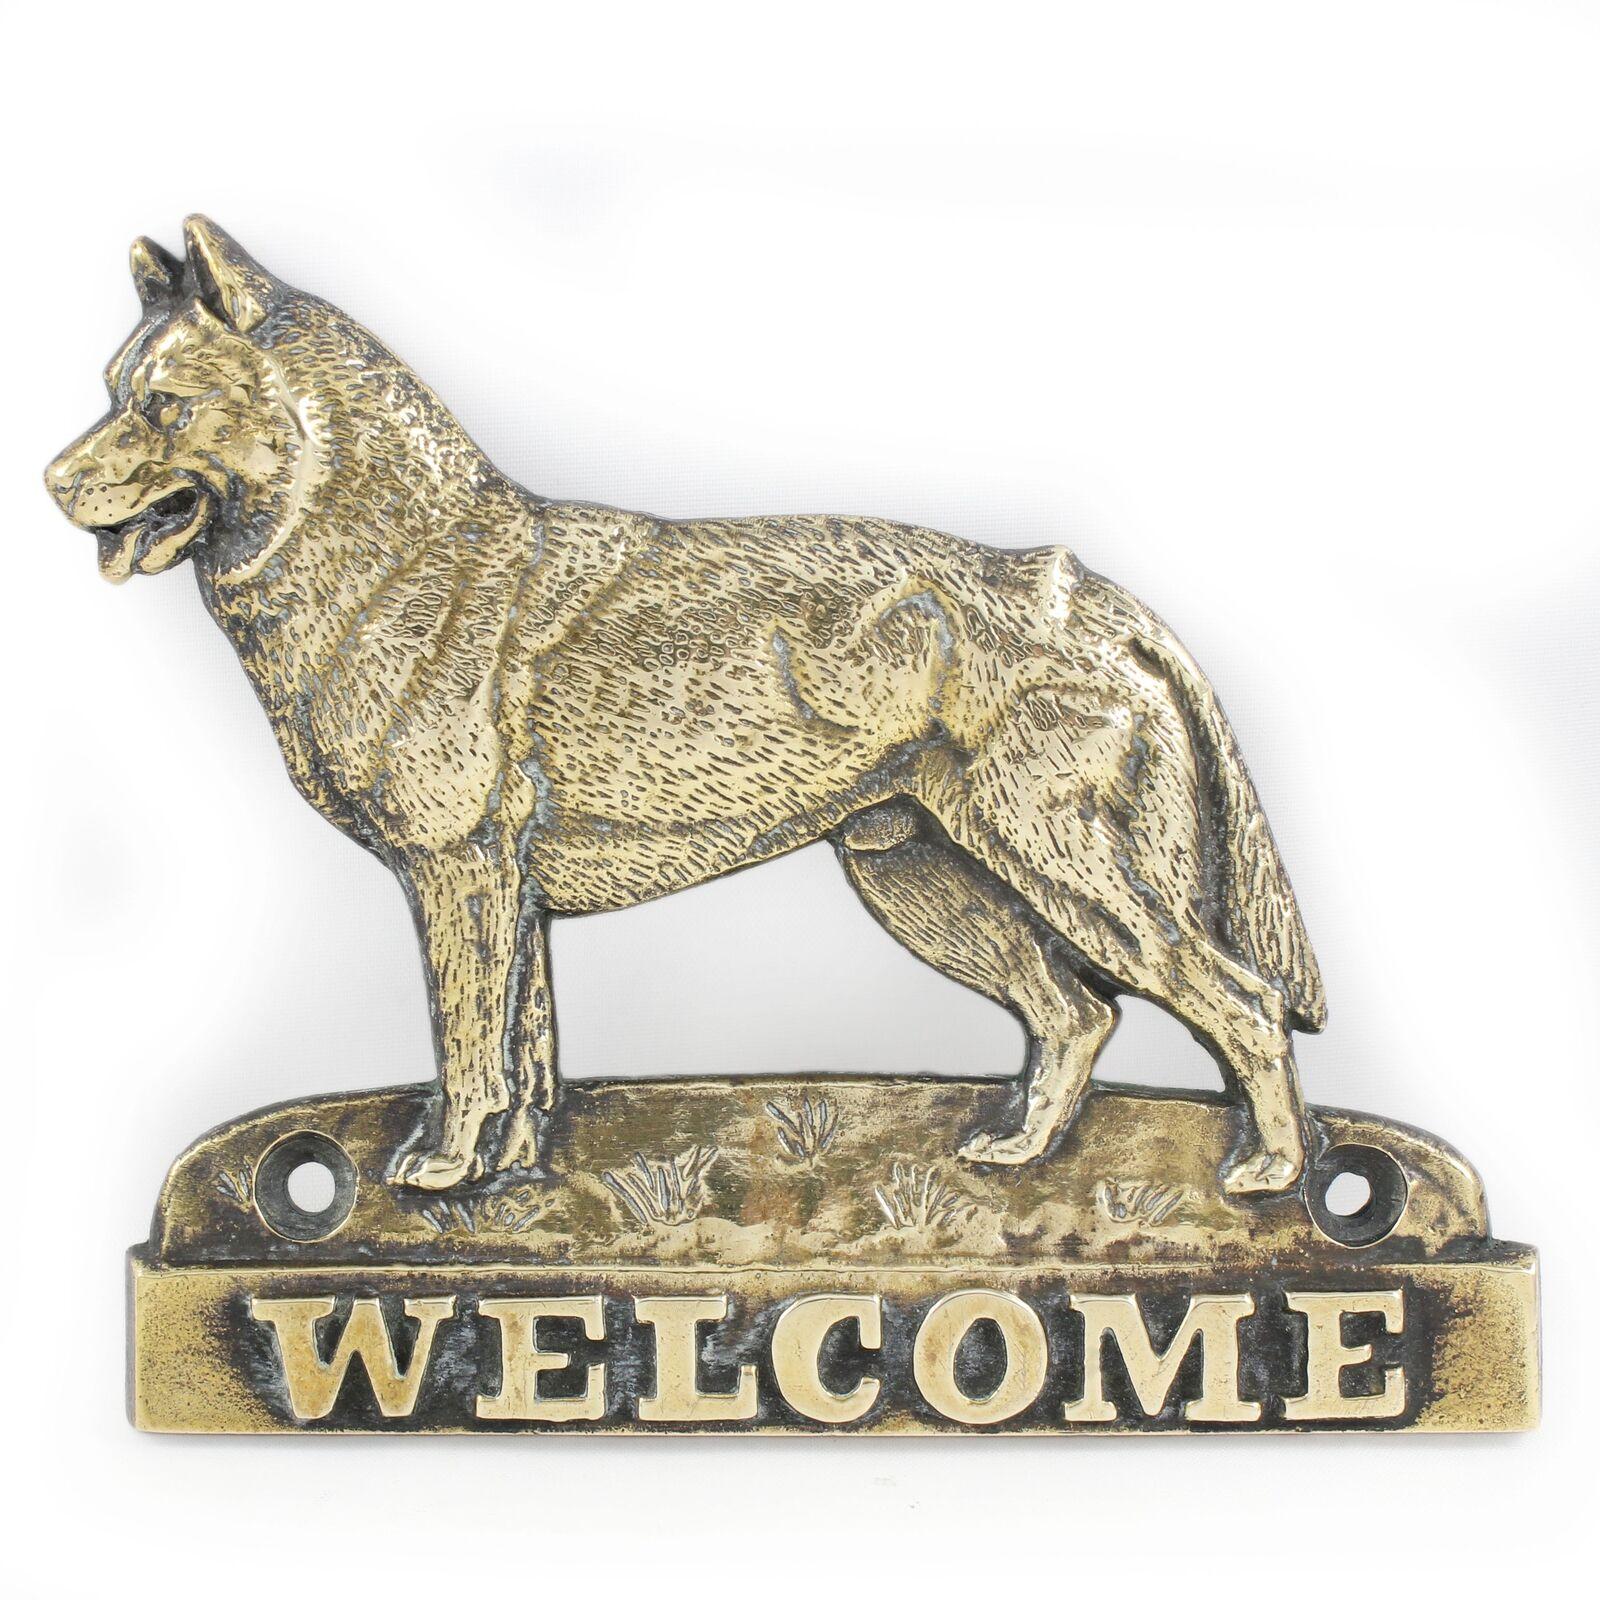 Siberian Husky - brass tablet with image of a dog, Art Dog